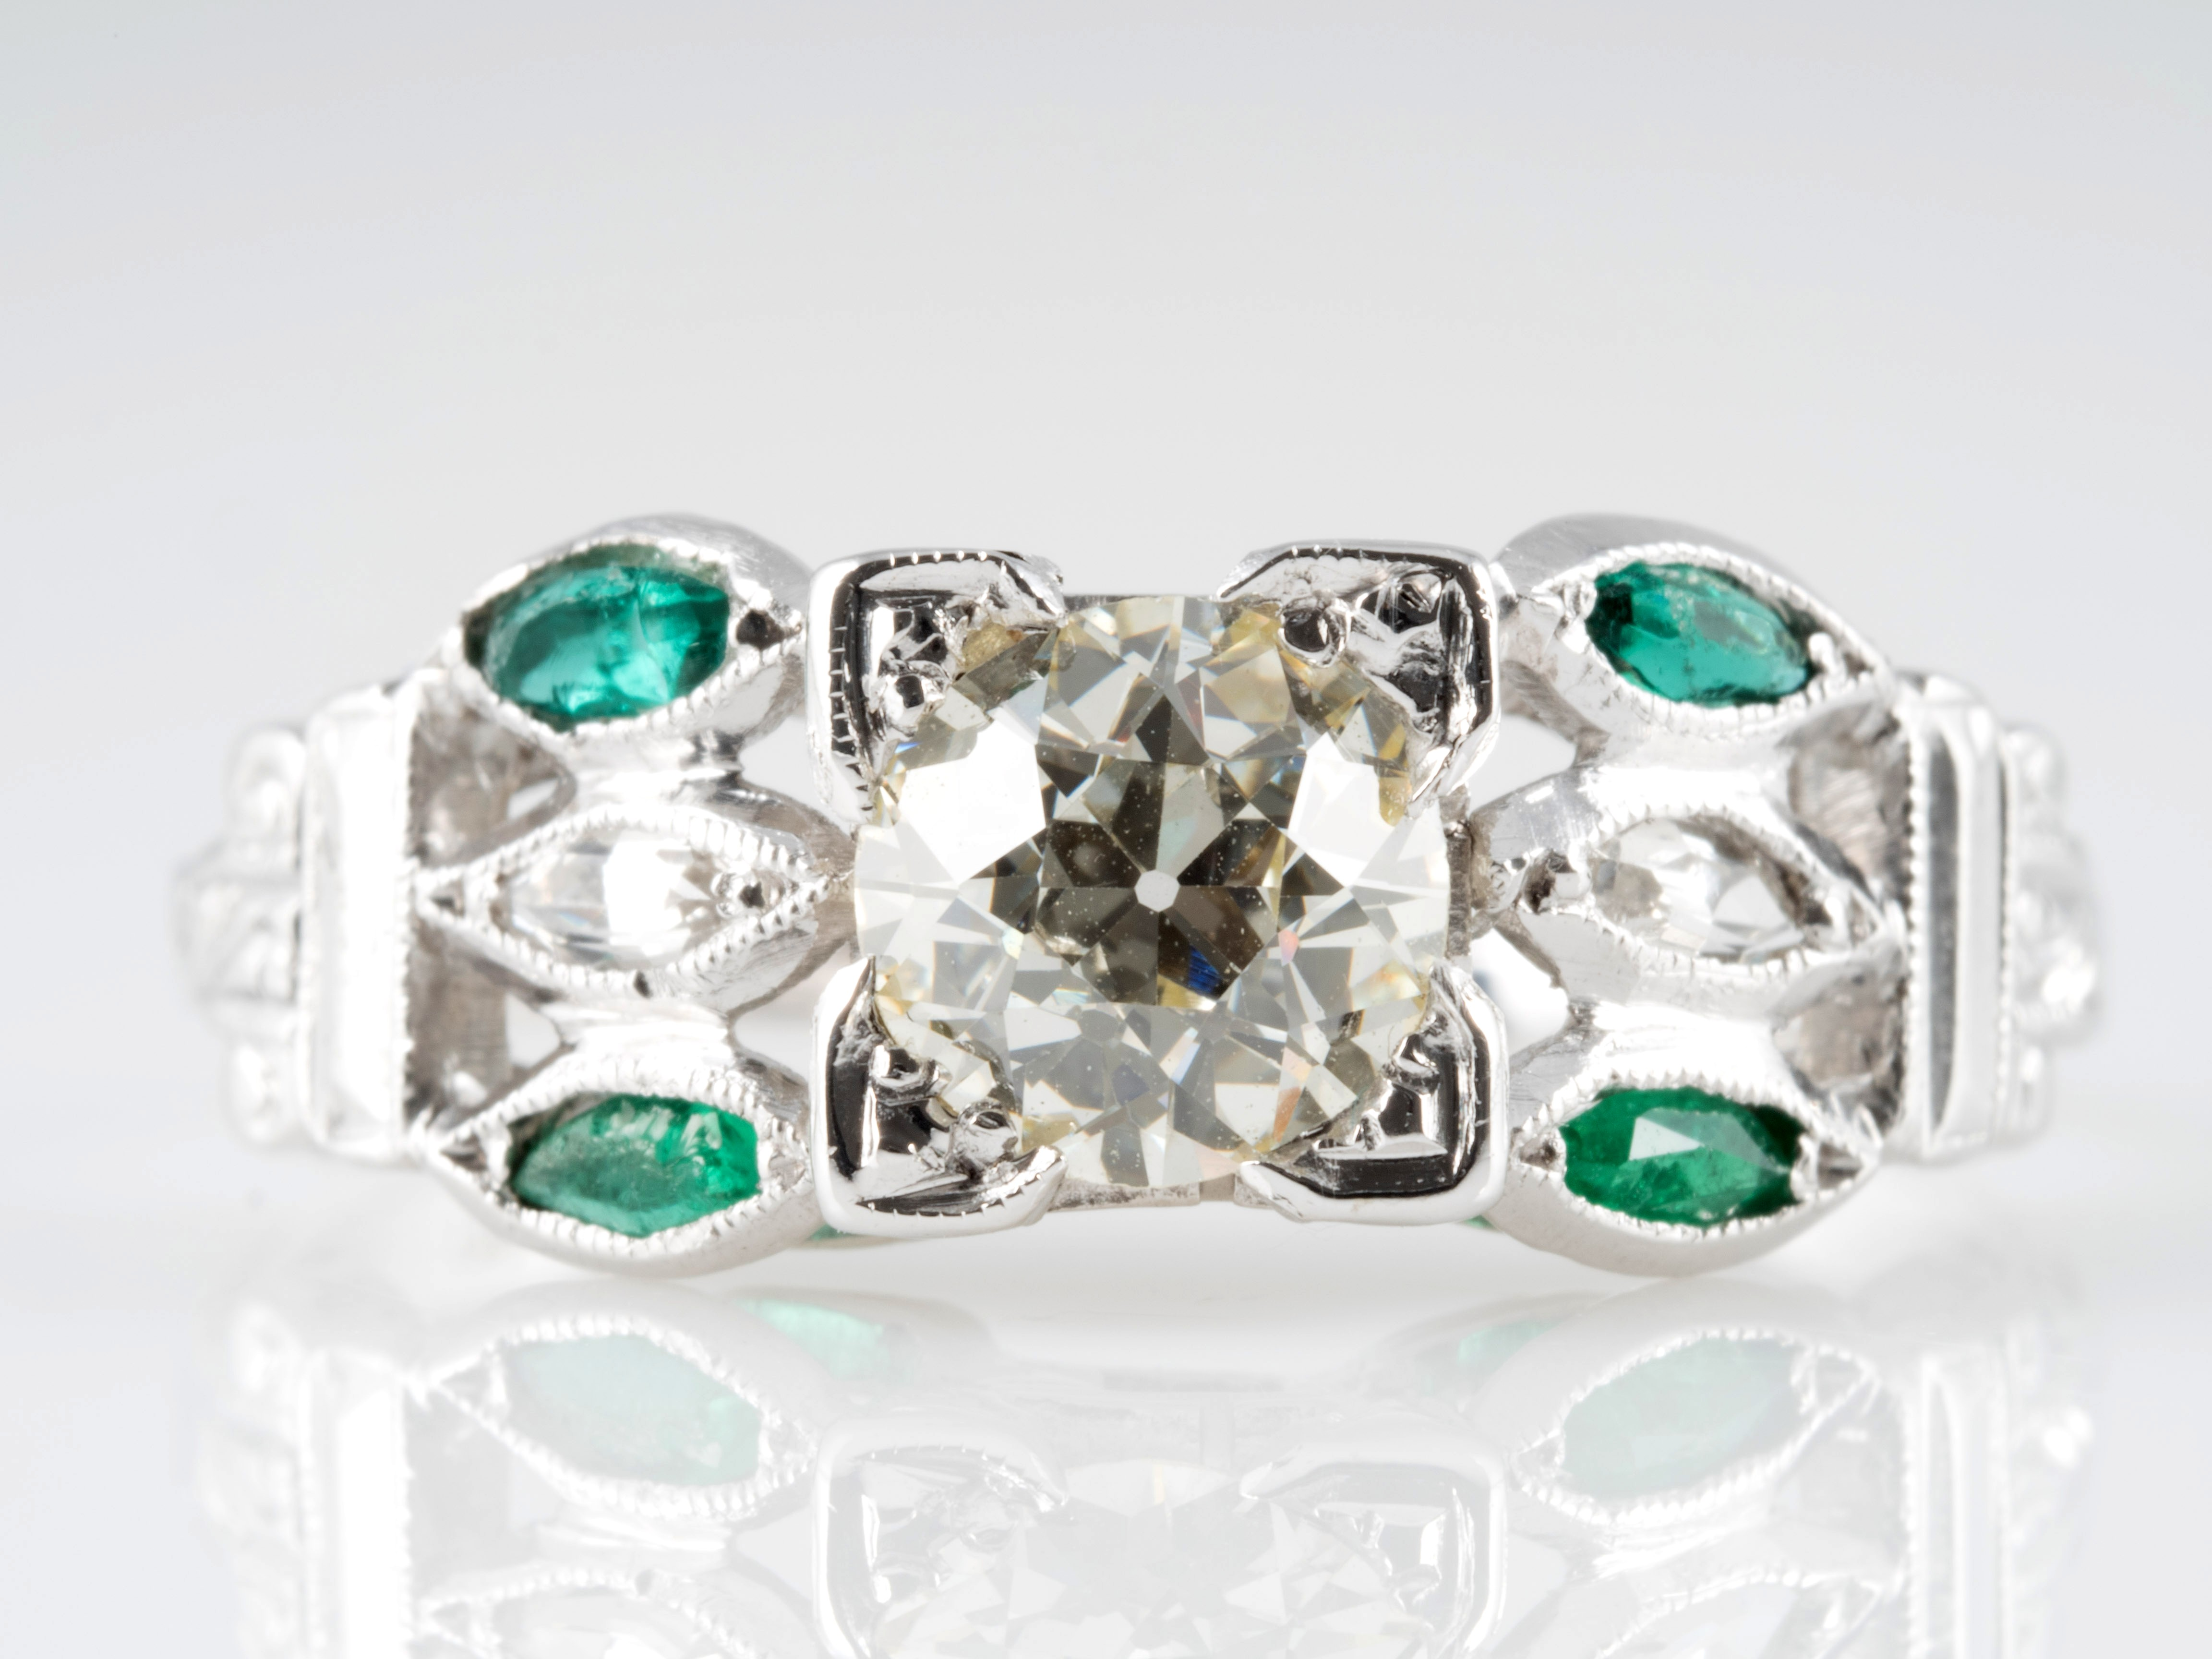 art deco ring diamant saphire smaragde 750 gold wert ca eur ebay. Black Bedroom Furniture Sets. Home Design Ideas